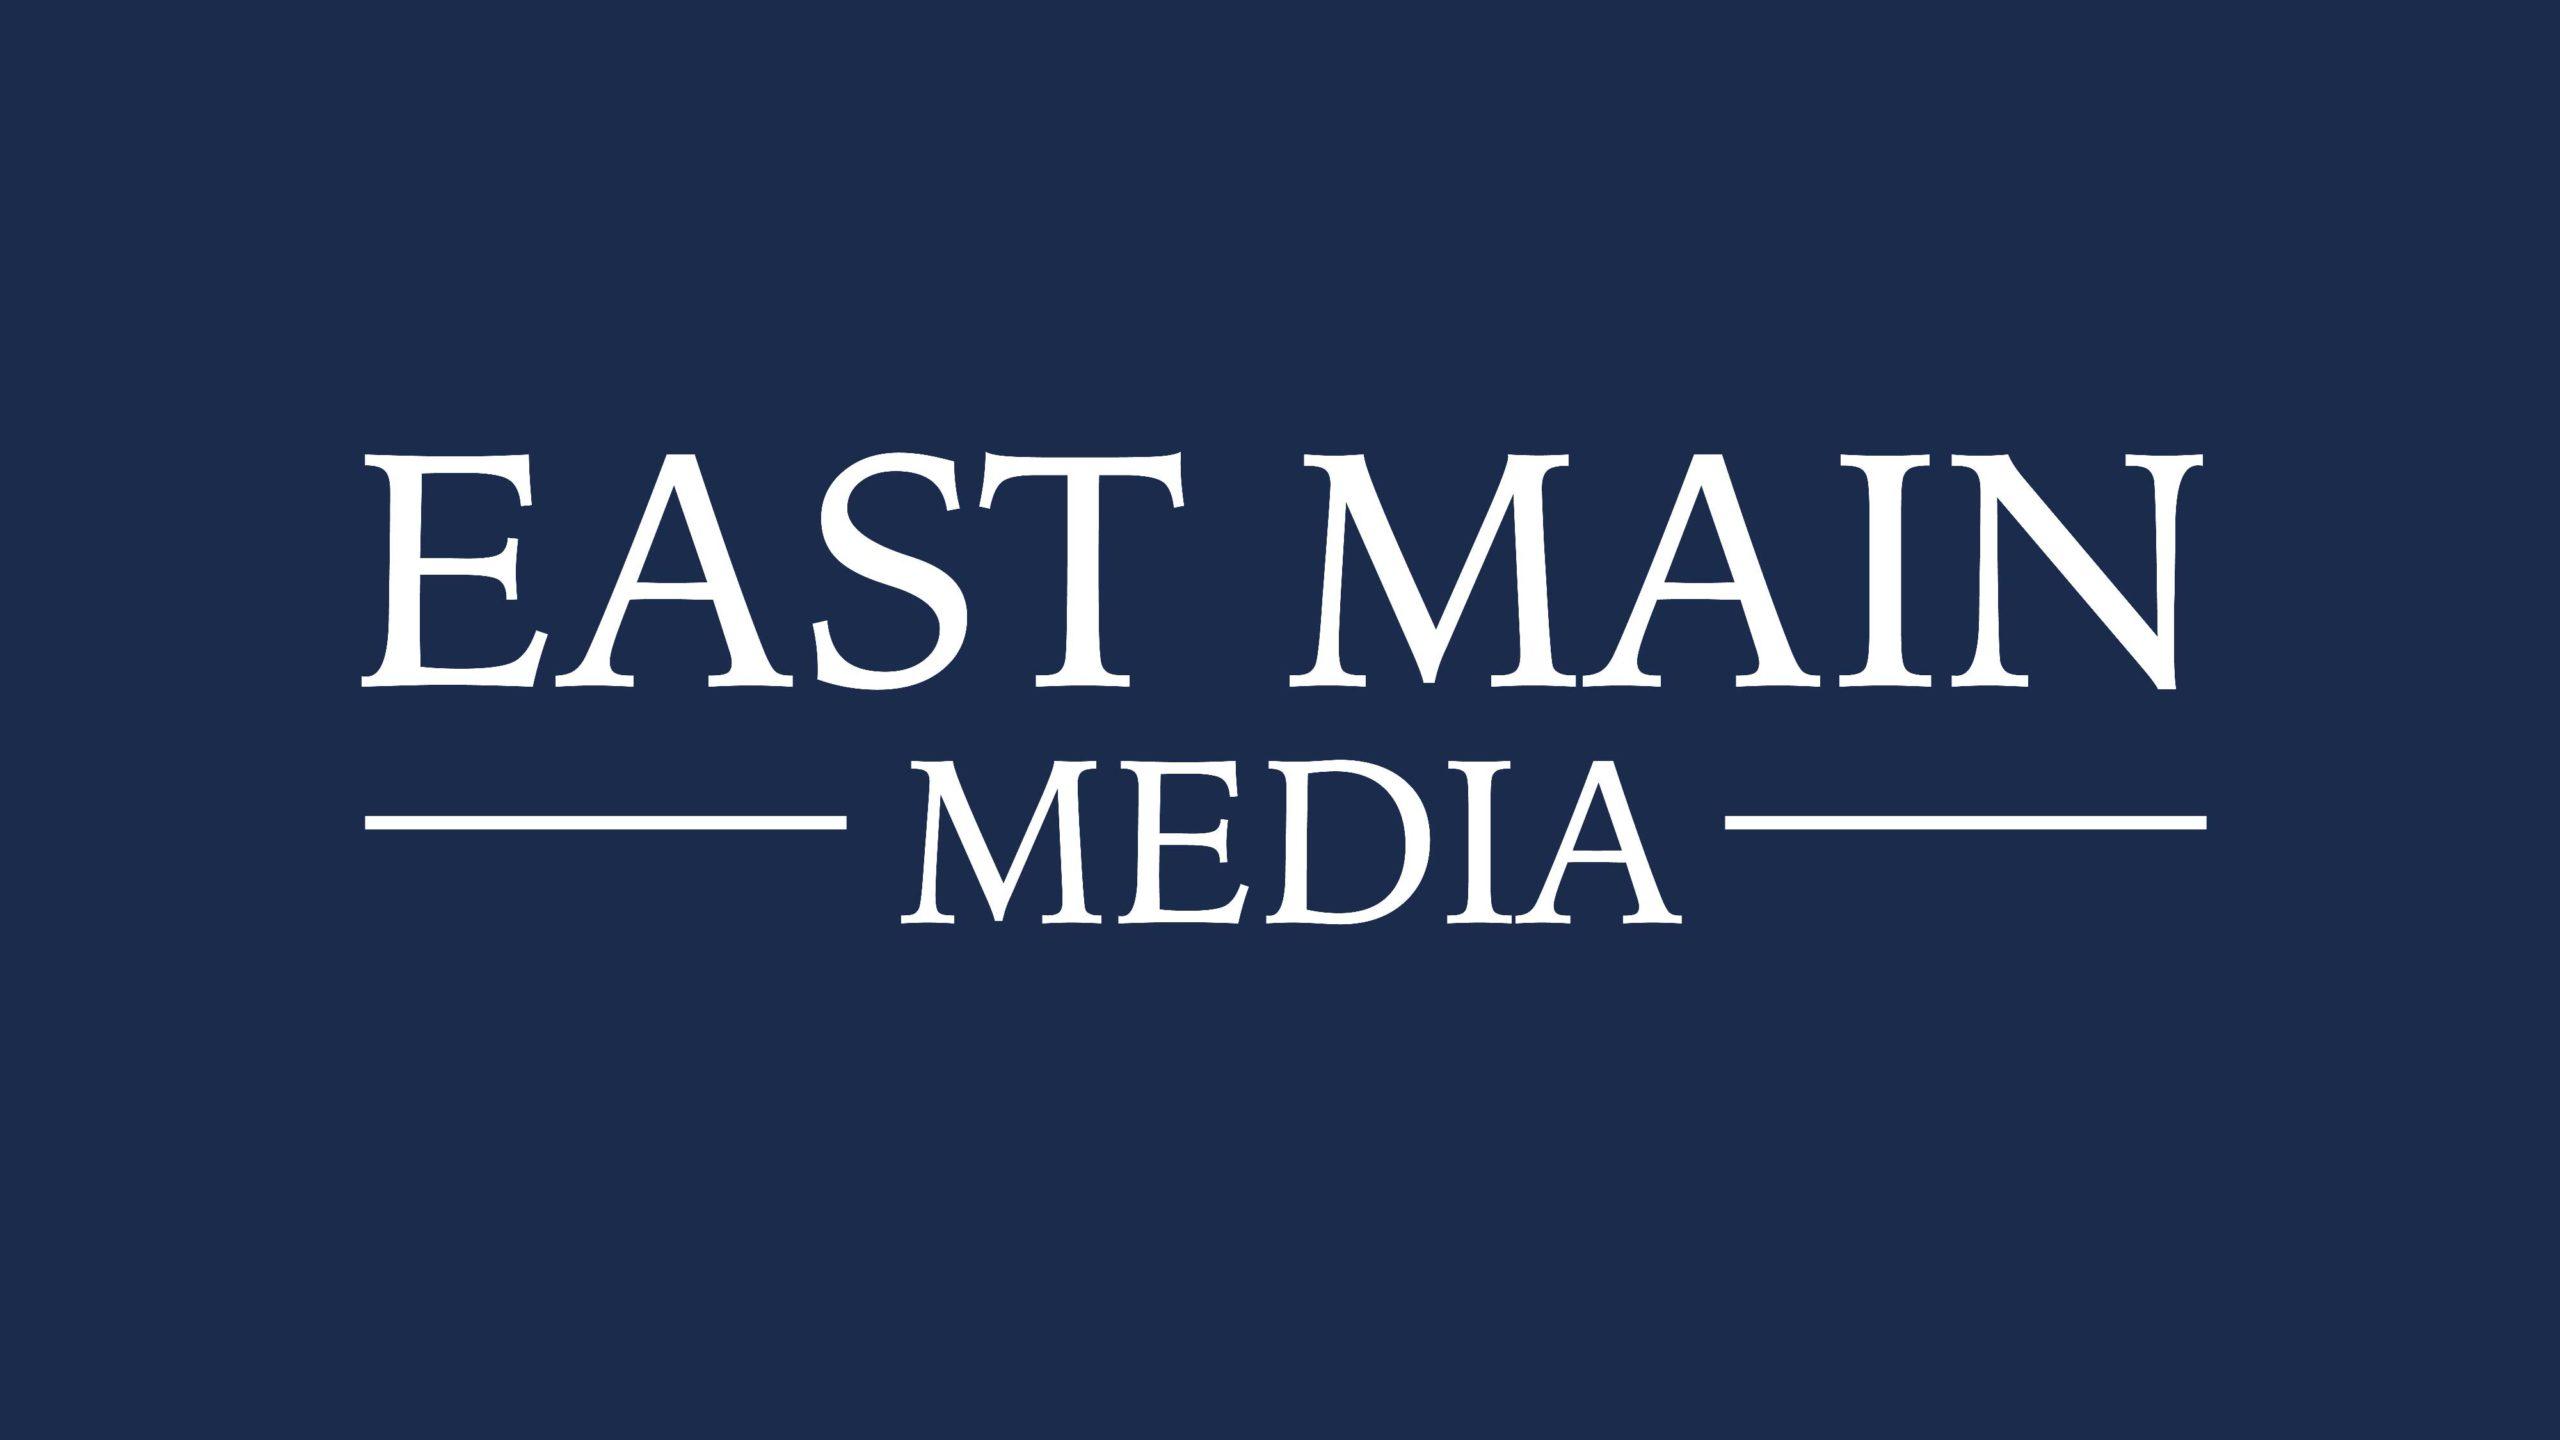 East main media logo